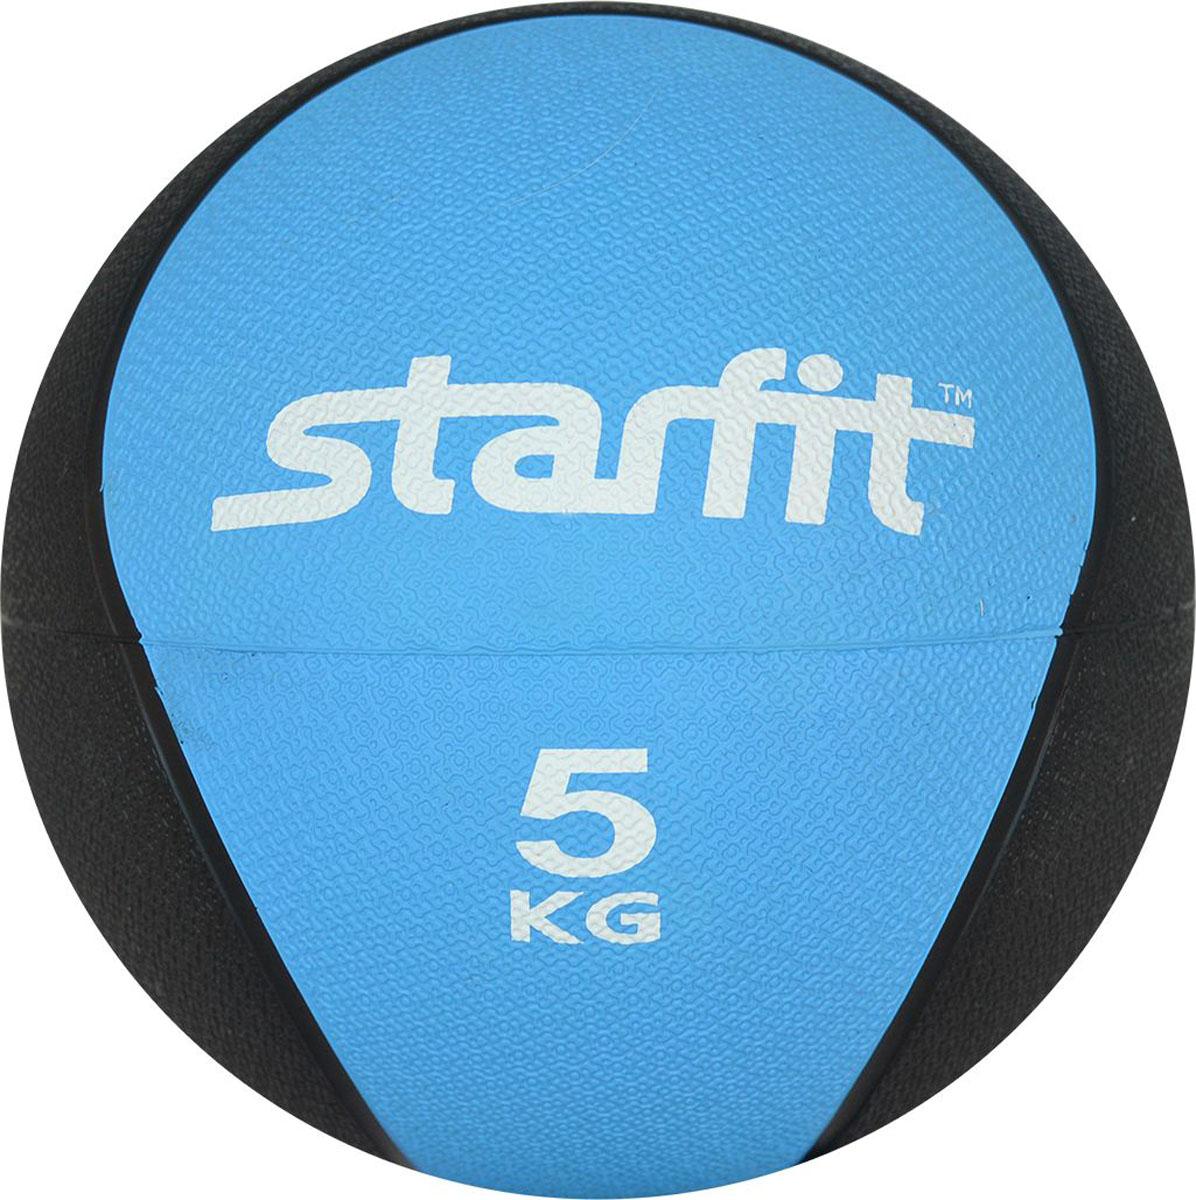 Медицинбол Starfit Pro GB-702, цвет: синий, 5 кг мячи спортивные starfit мяч гимнастический starfit gb 105 55 см прозрачный розовый